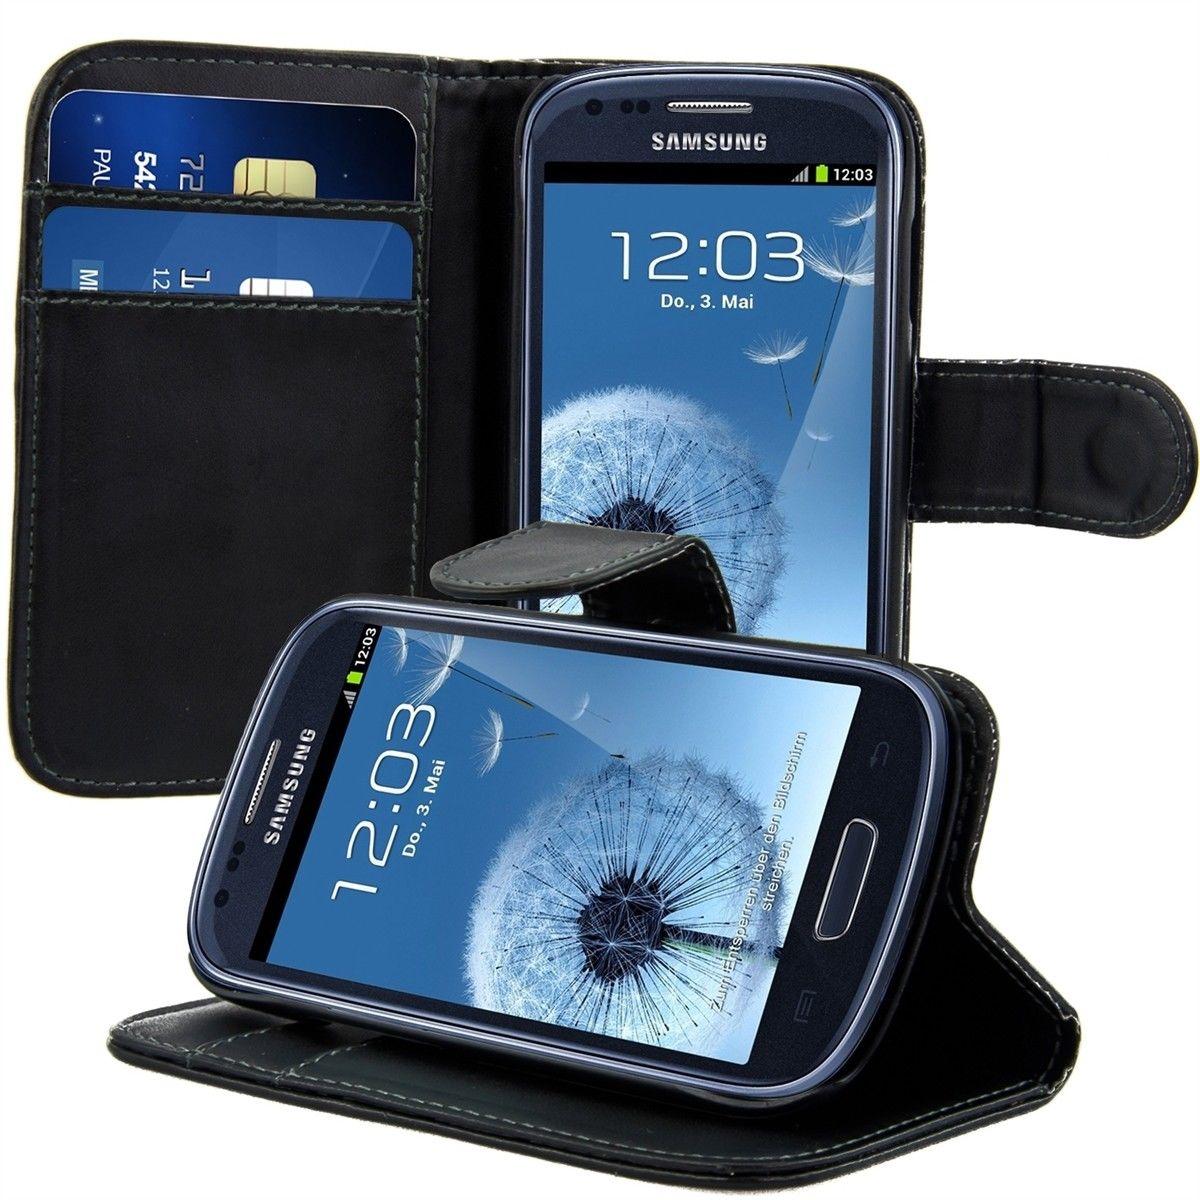 Pouzdro pro Samsung Galaxy S3 Mini černé